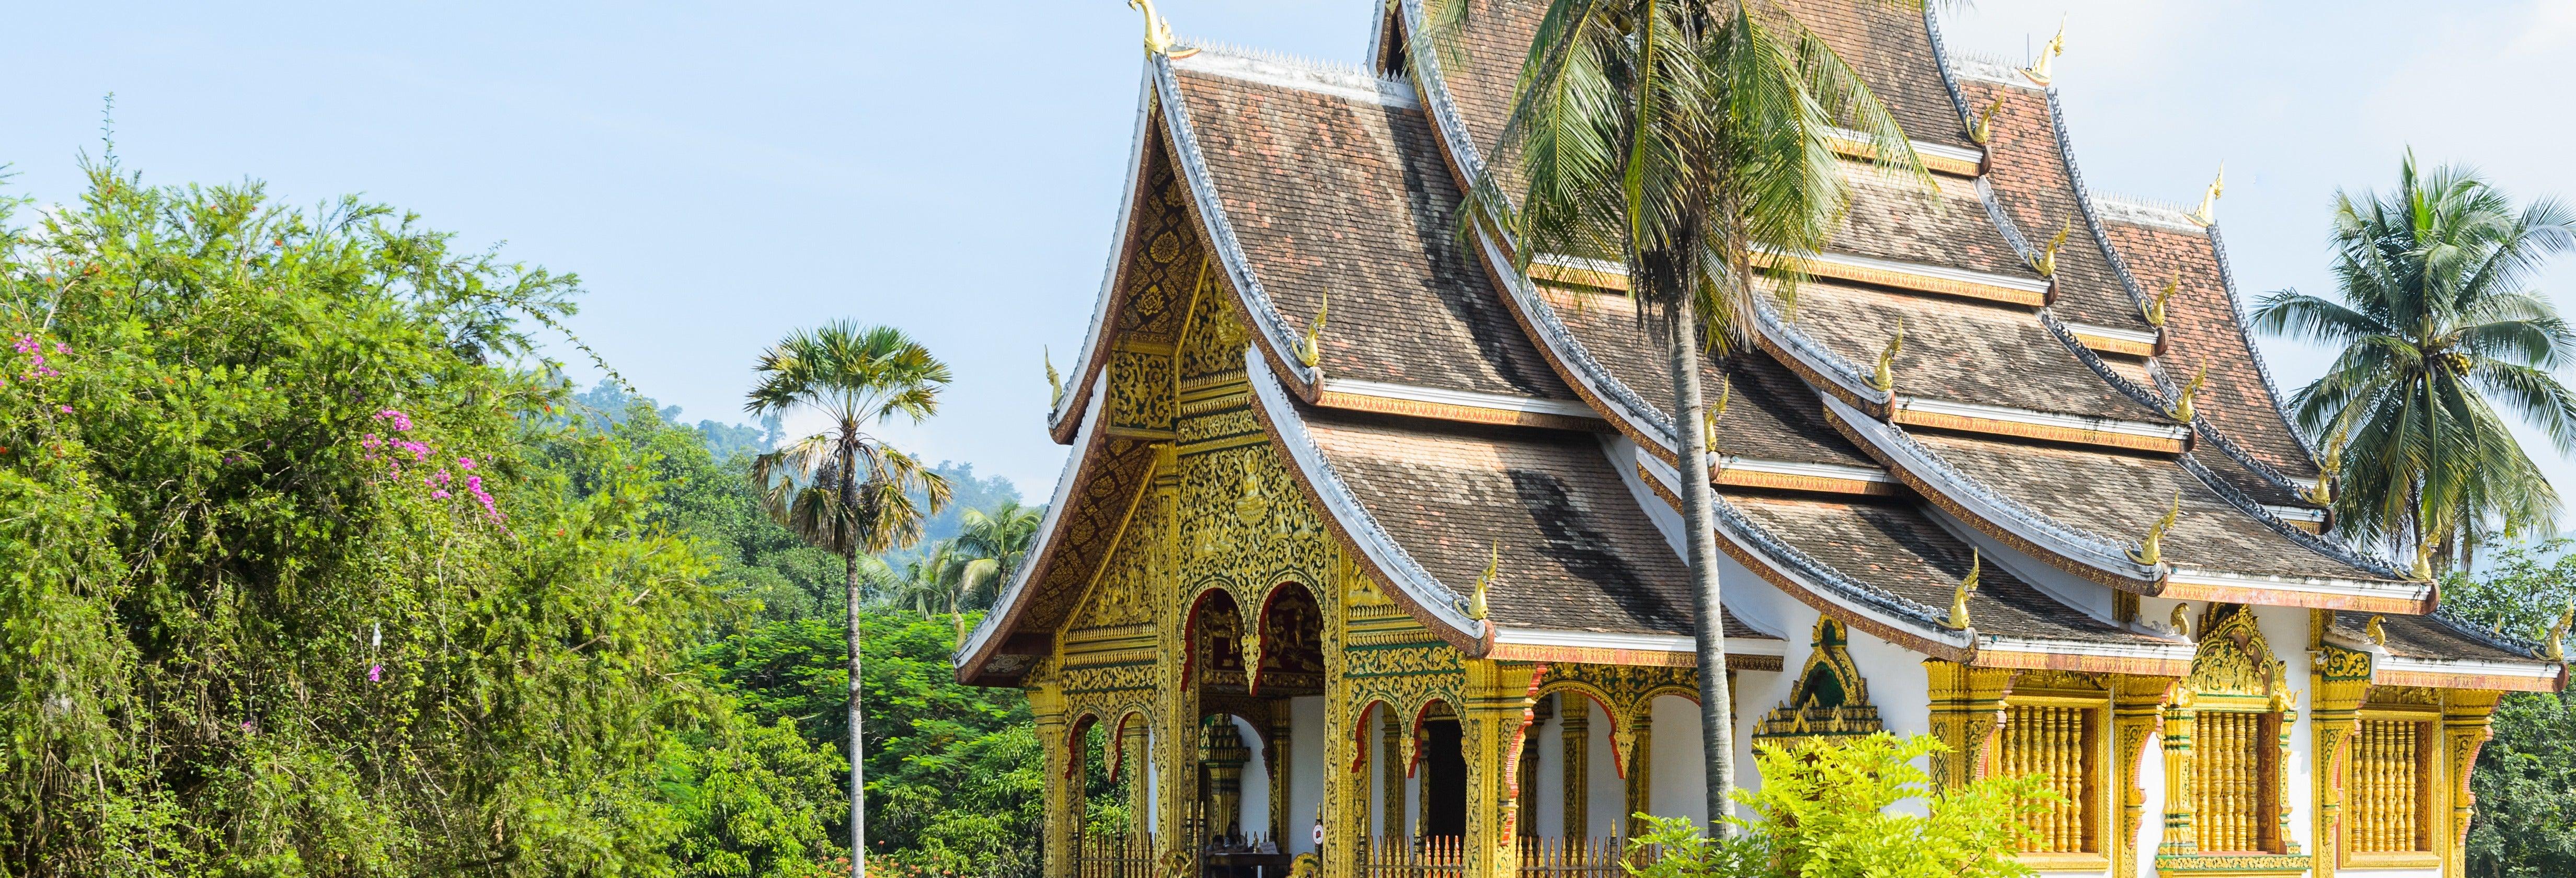 Luang Prabang 3 Day Tour